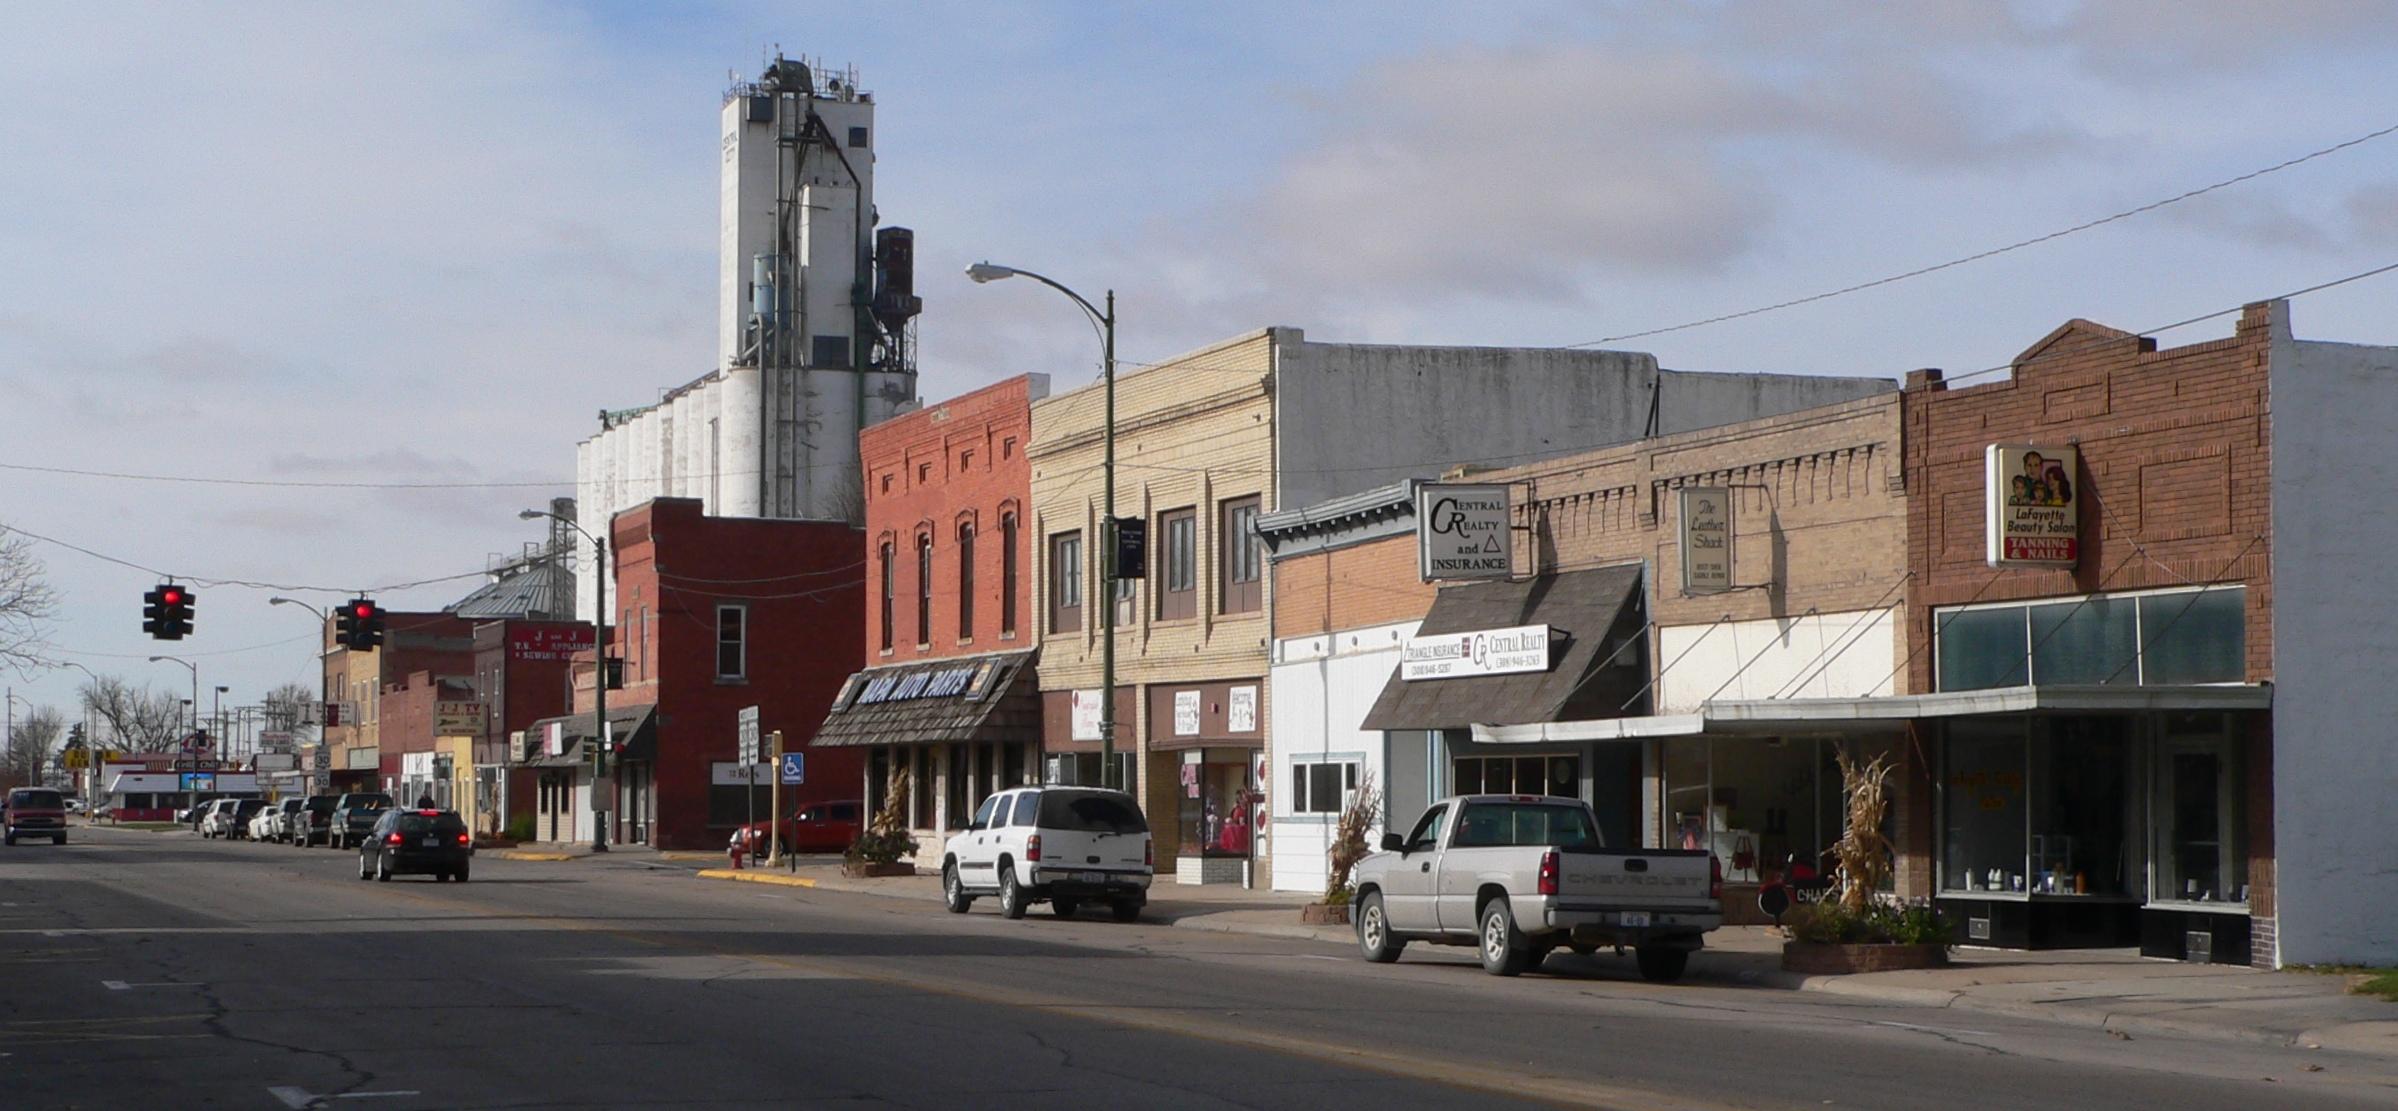 loup city hindu dating site Discover swingers around you in nebraska choose a city below to see swingers in nebraska.